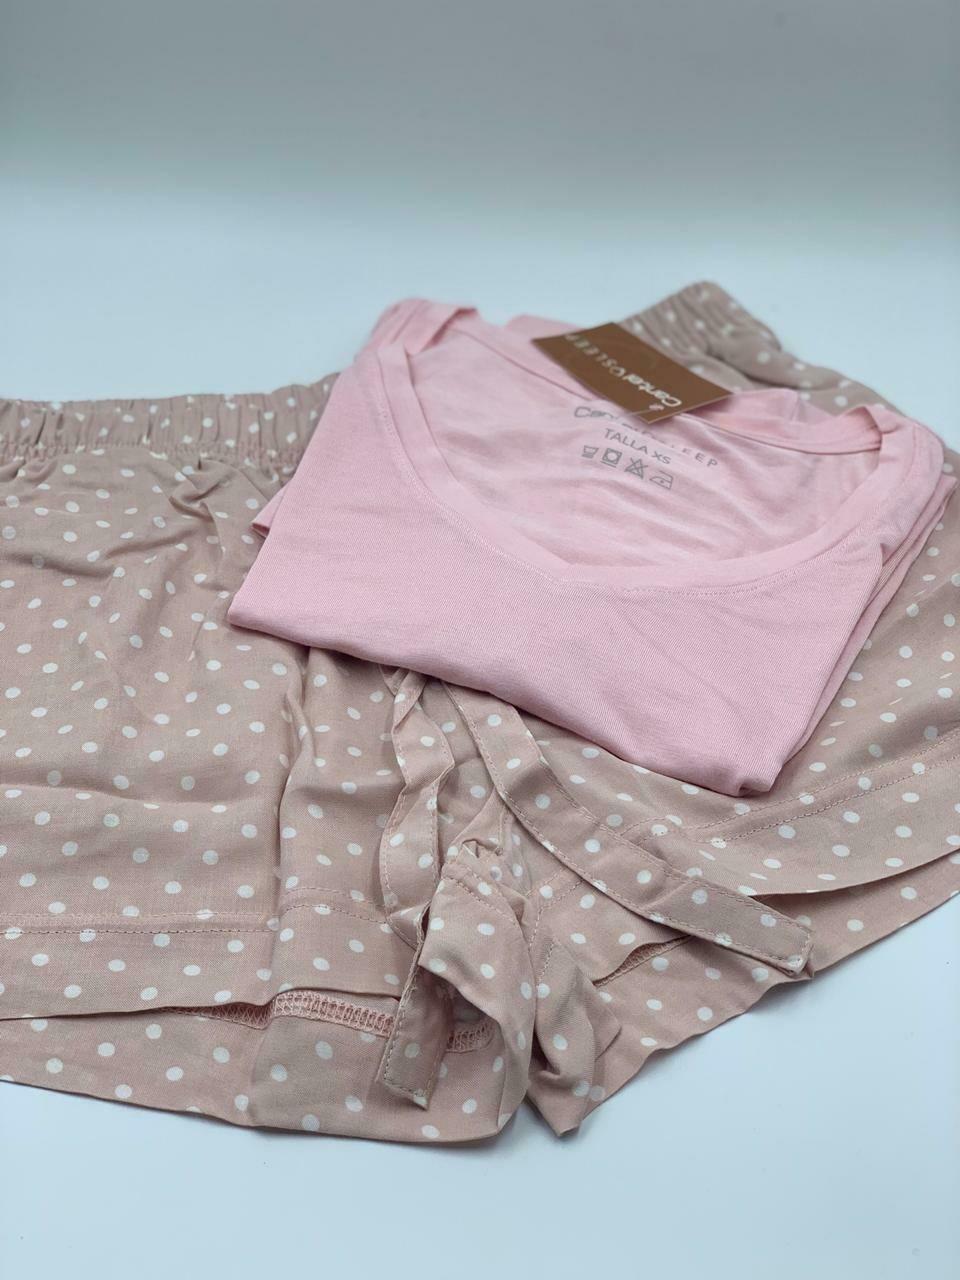 Short Pijama Cantel Sleep Dama Base Seduction Rosa/Blanco Otoño 2020